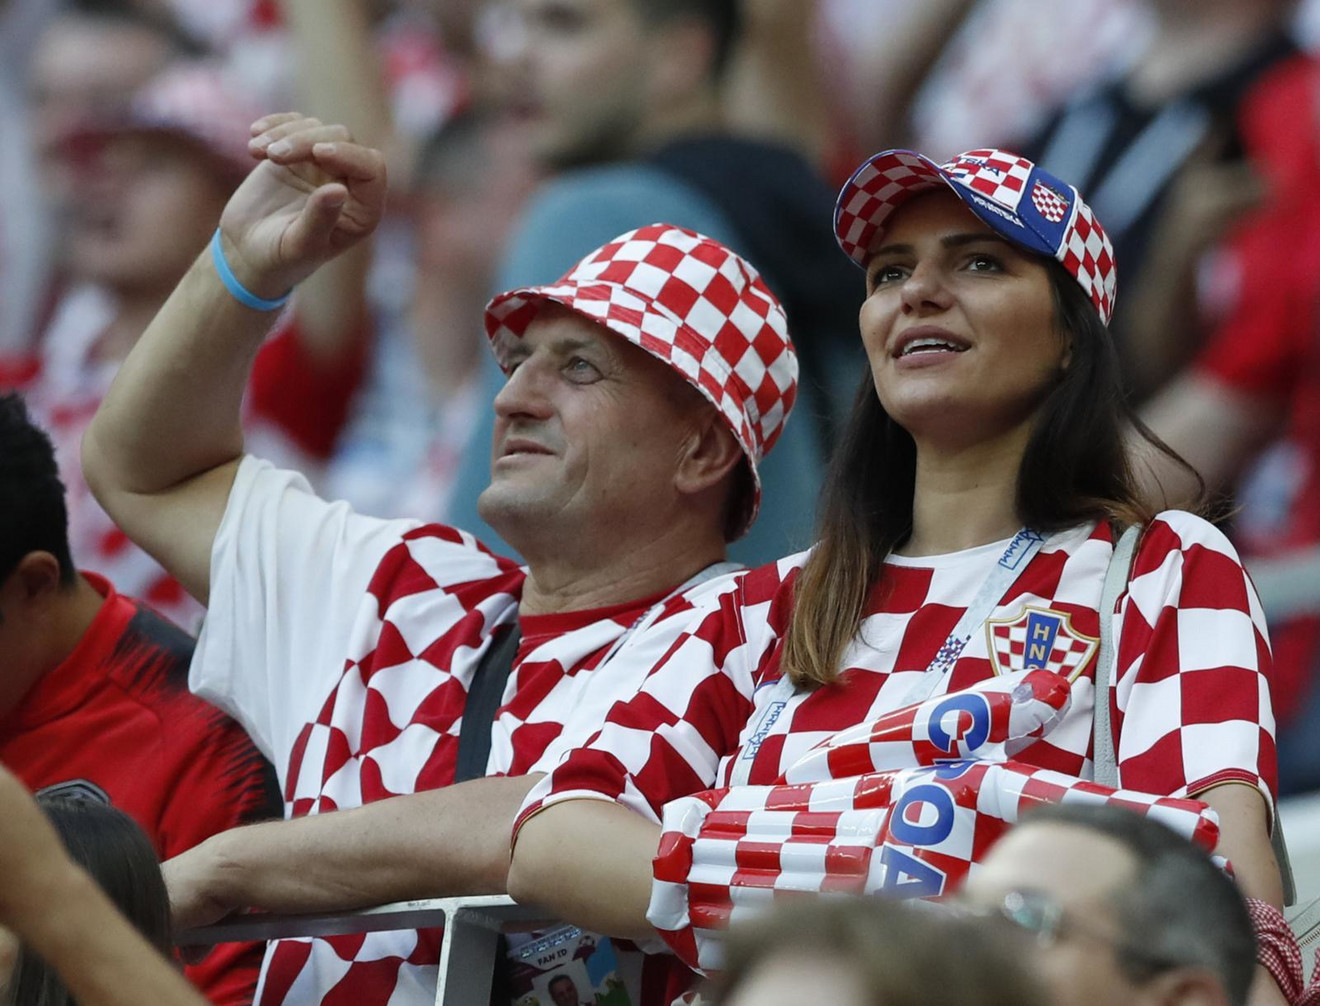 Prelepa Hrvatica na tribinama